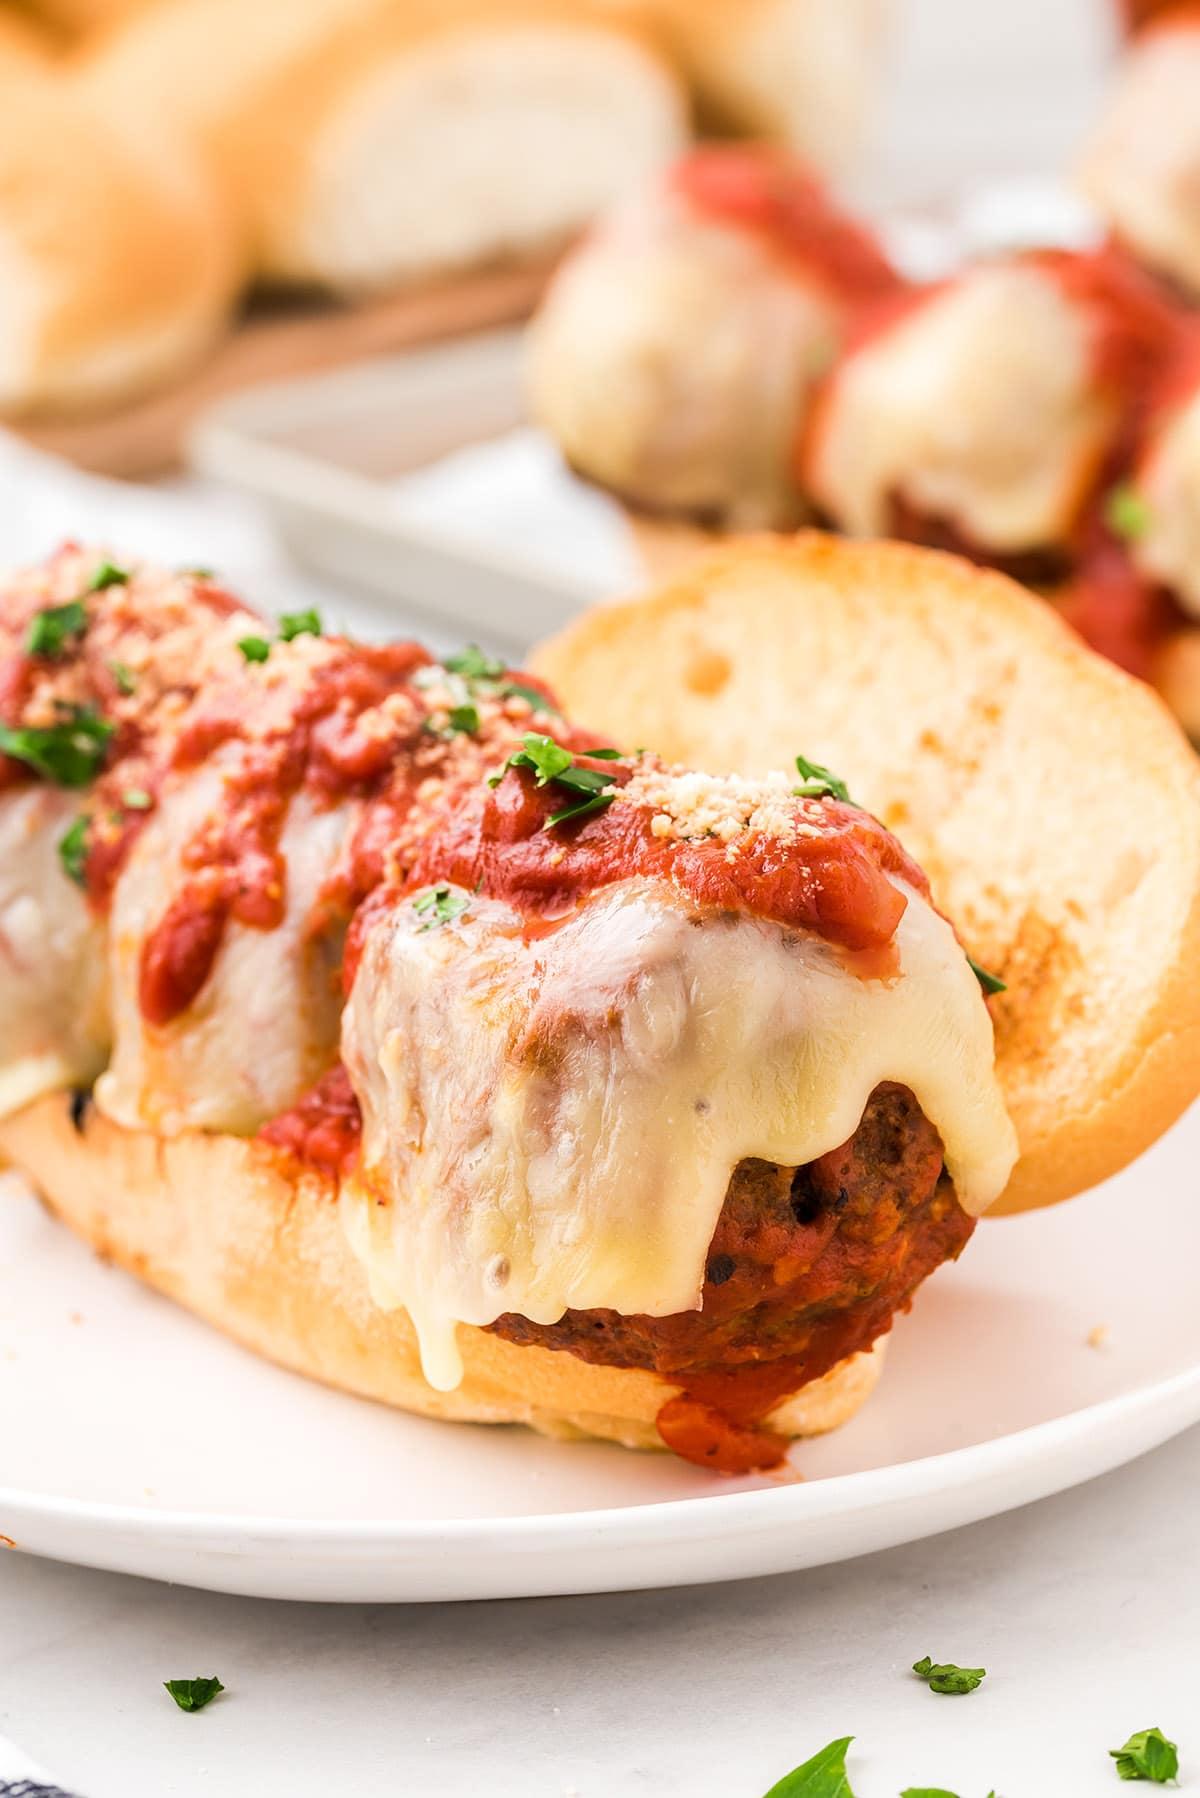 meatball subs on a plate